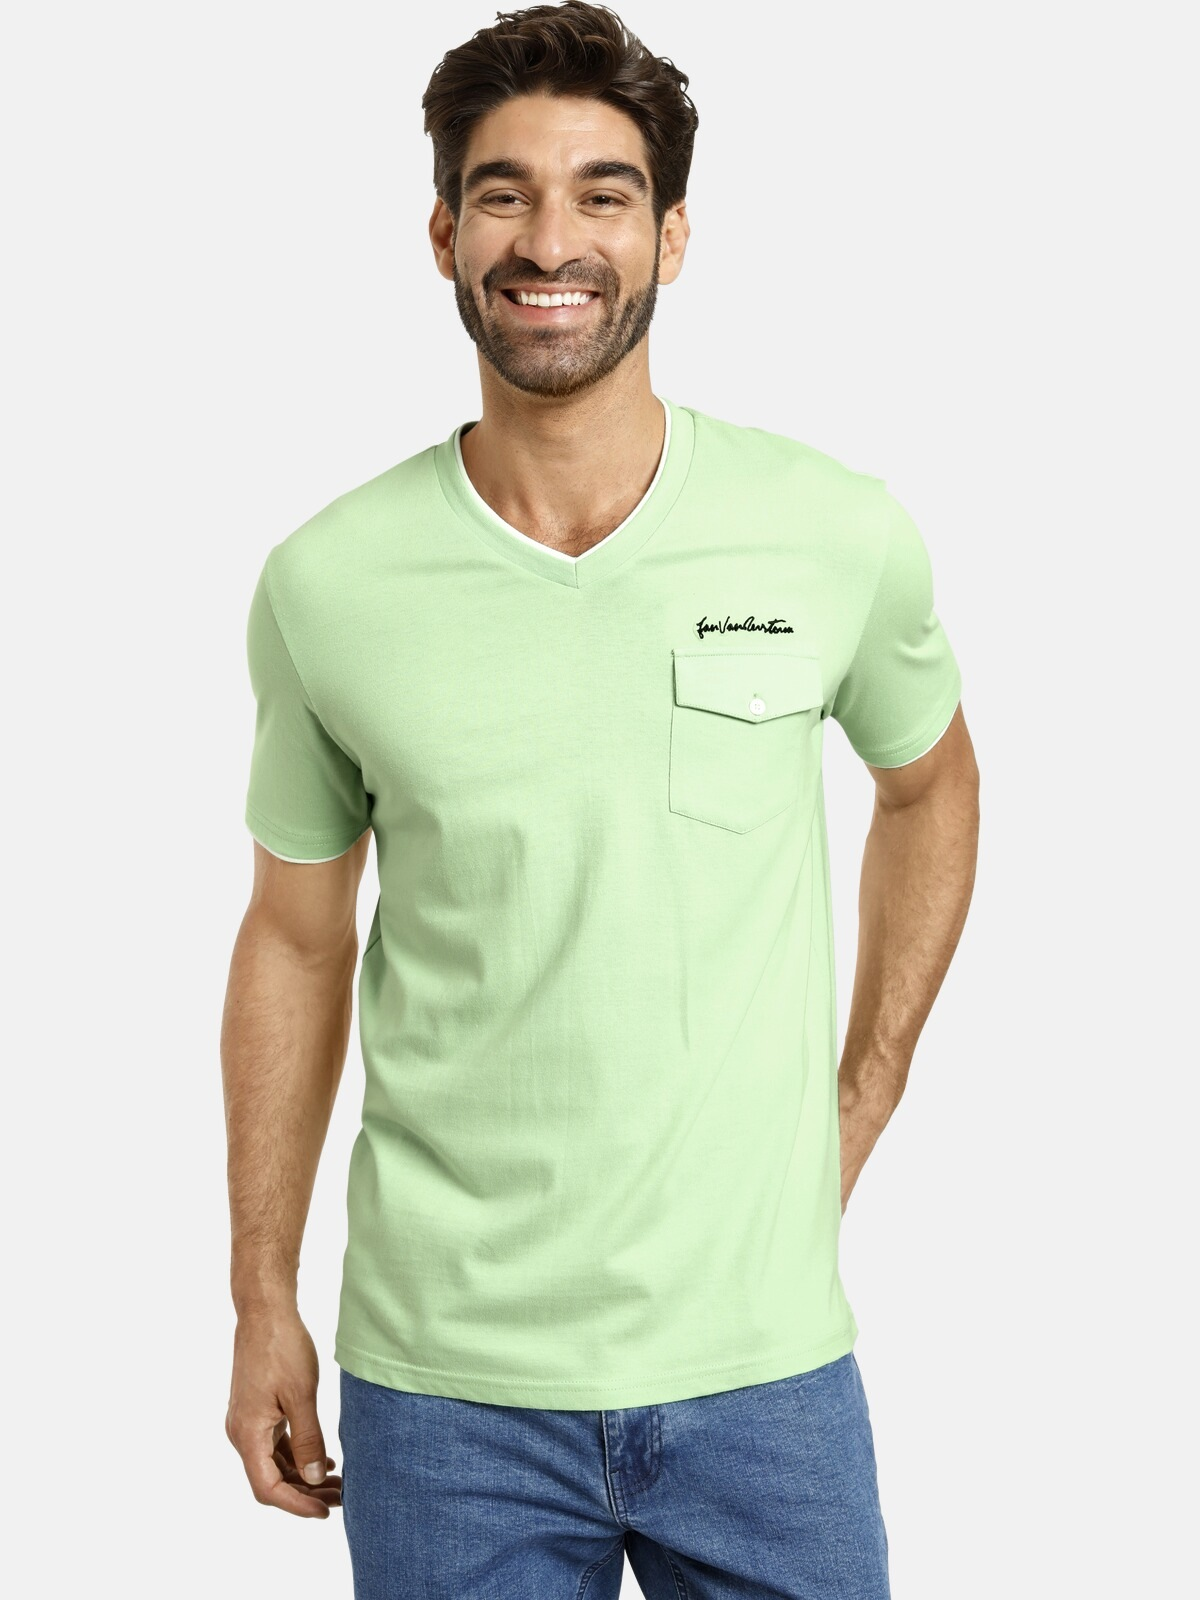 jan vanderstorm -  T-Shirt LENNARD, Doppellagen-Look